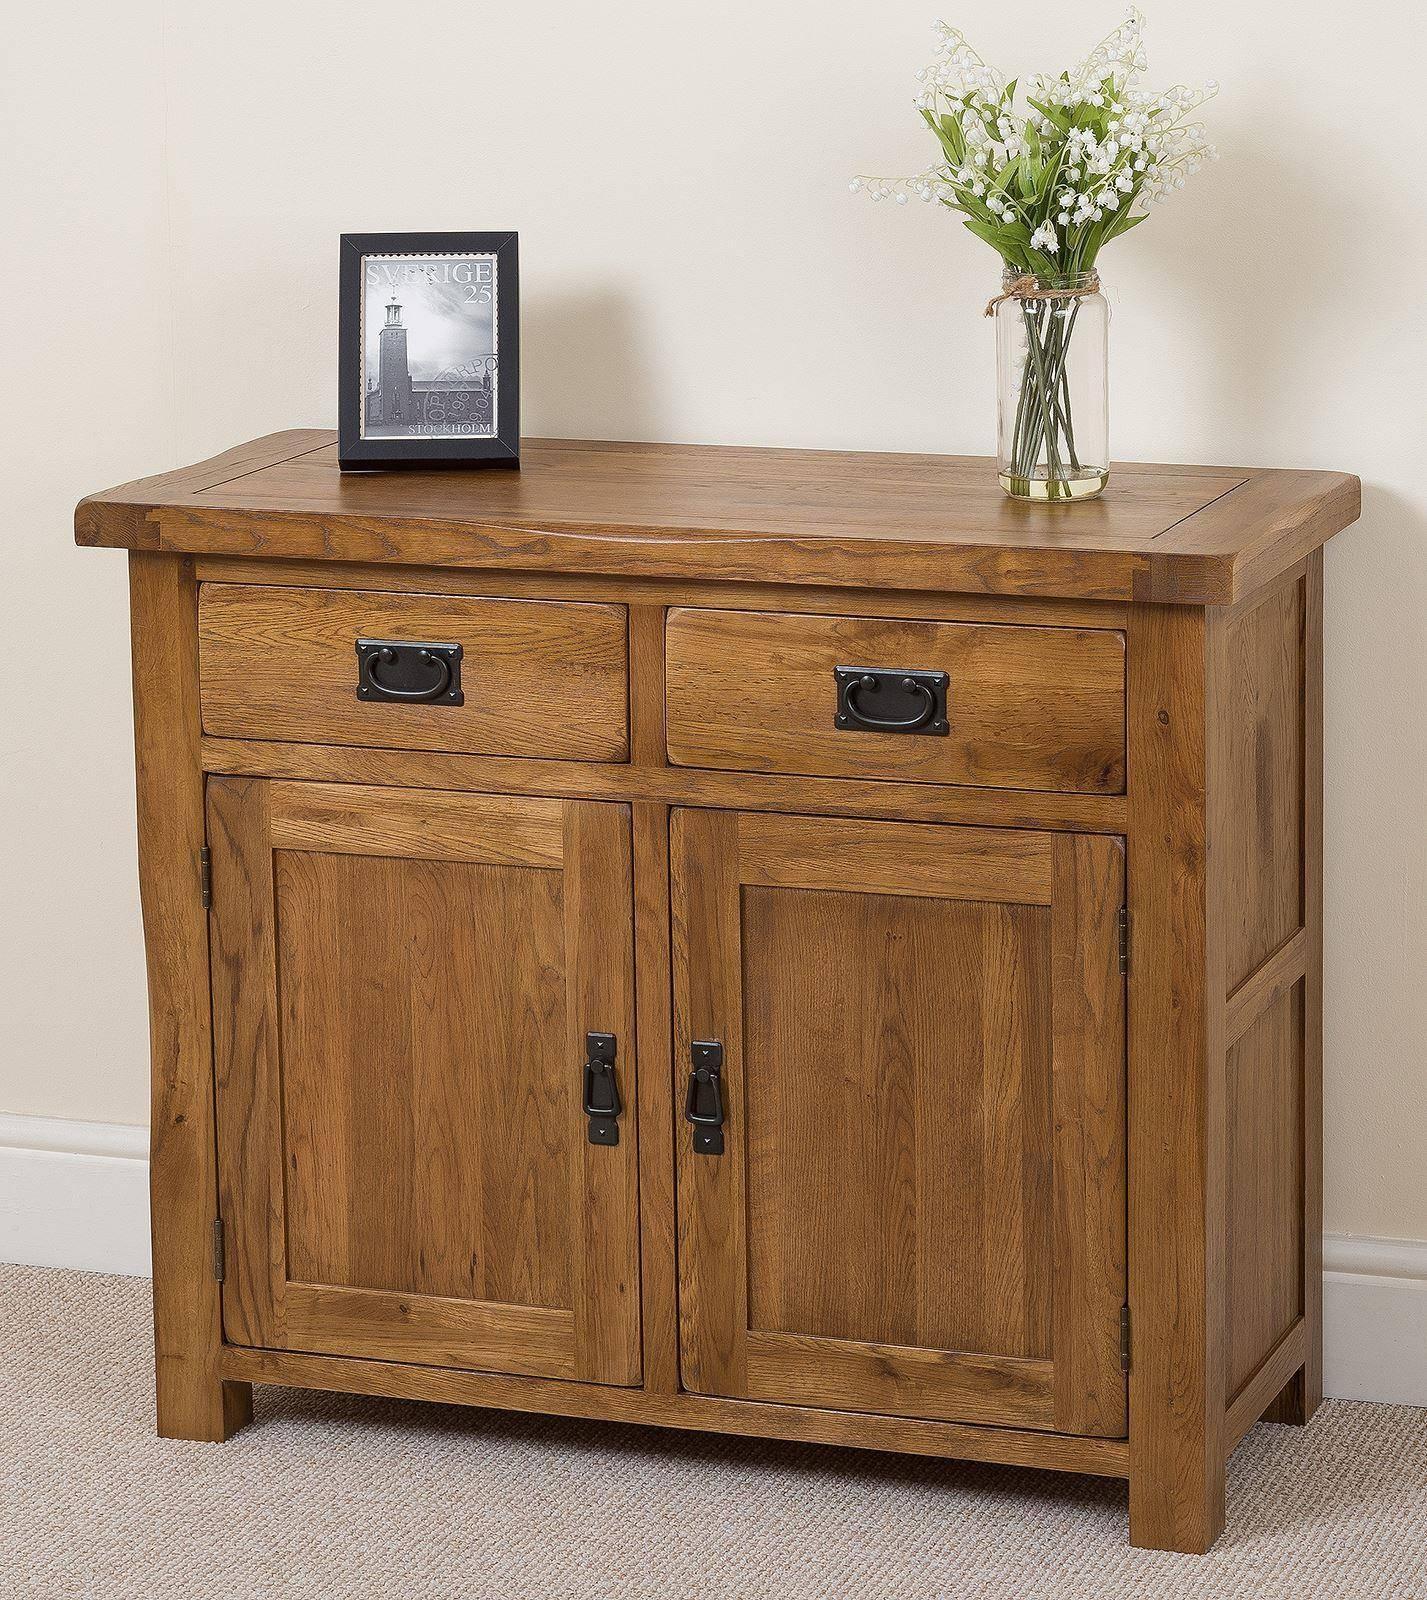 Cotswold Rustic Solid Oak Small Sideboard | Oak Furniture King In Small Wooden Sideboard (#8 of 20)